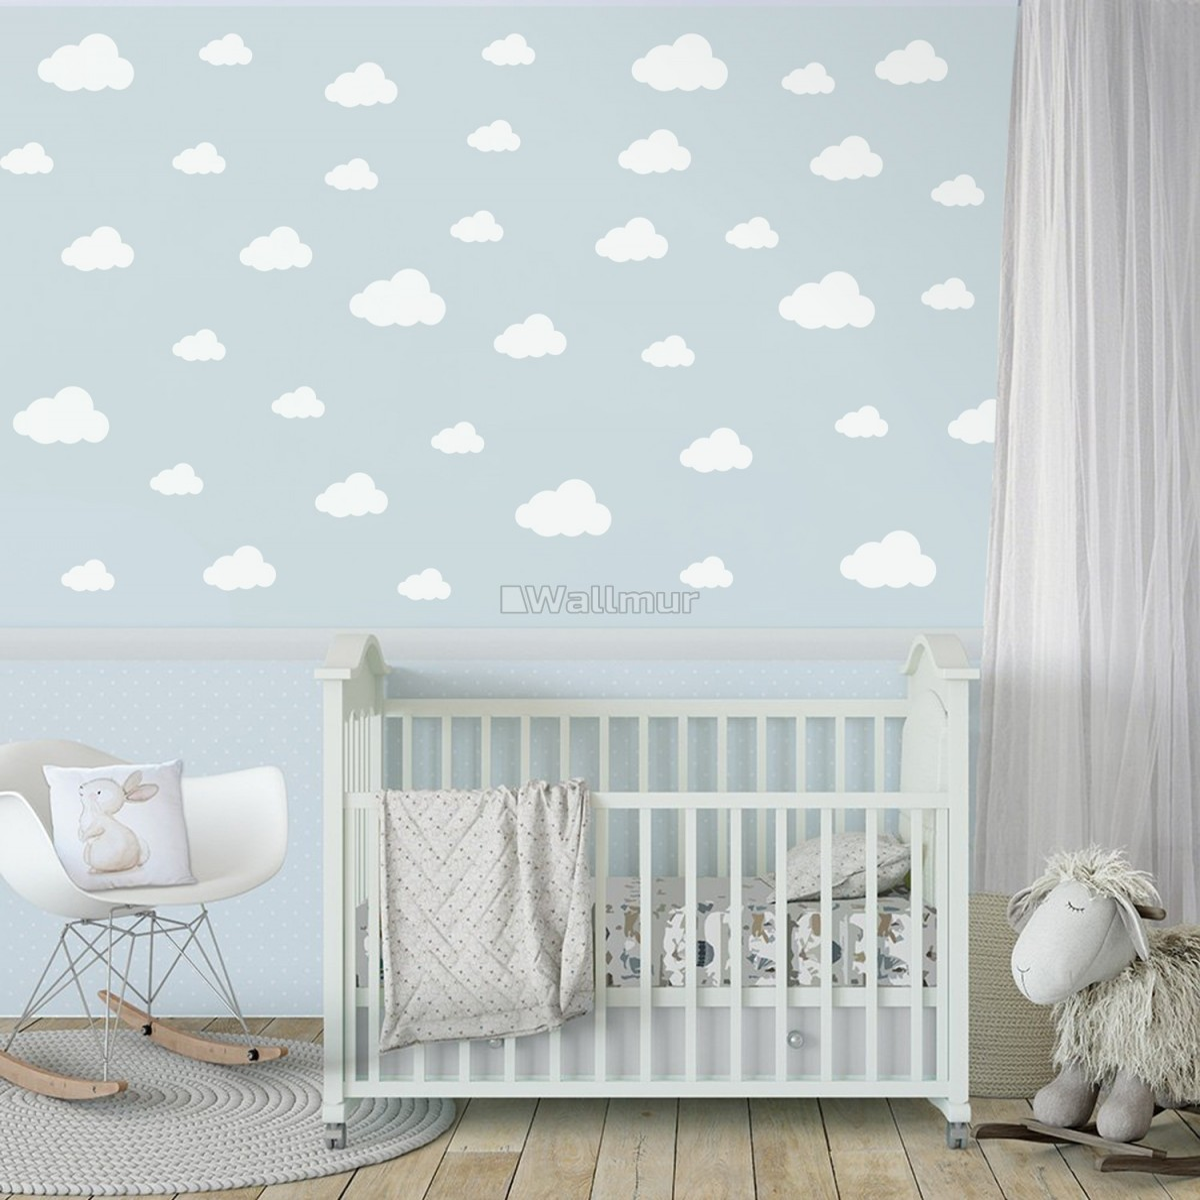 Nursery White Little Cloud Wall Decal Sticker